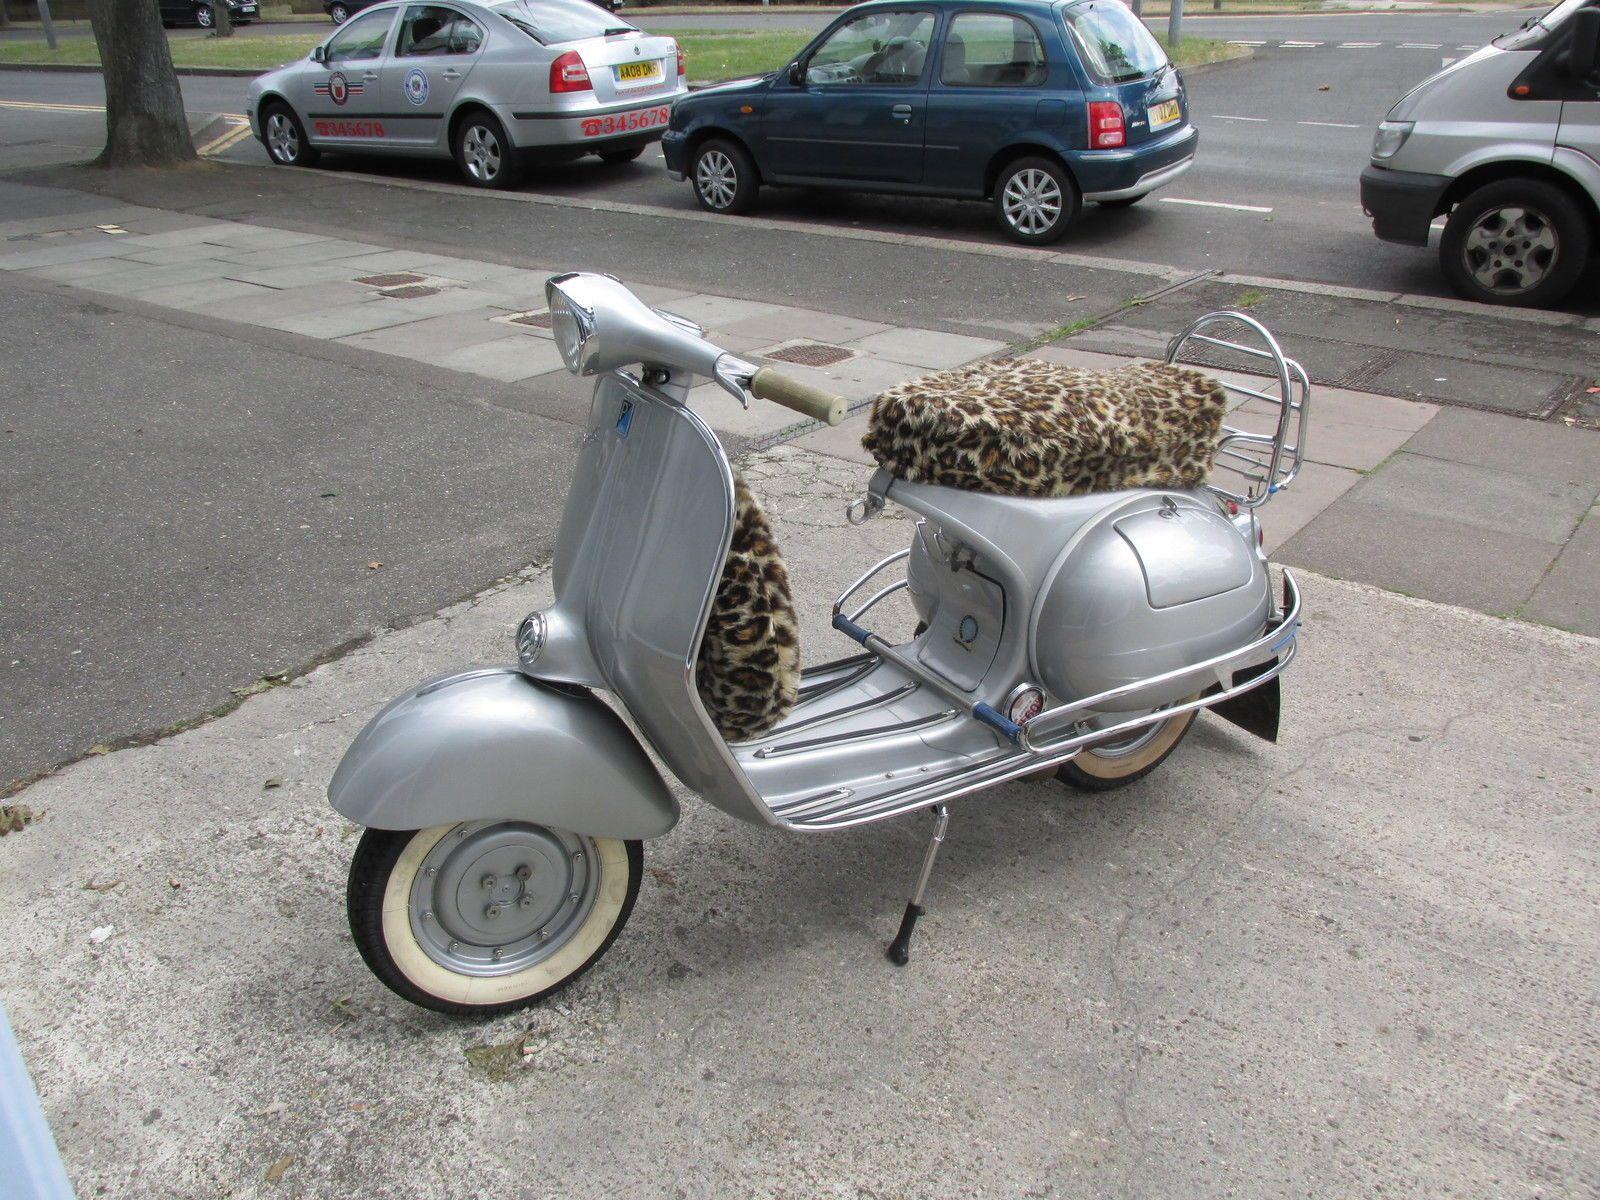 http://www.ebay.co.uk/itm/Vespa-1956-GS-150-VS2-Classic-Scooter ...